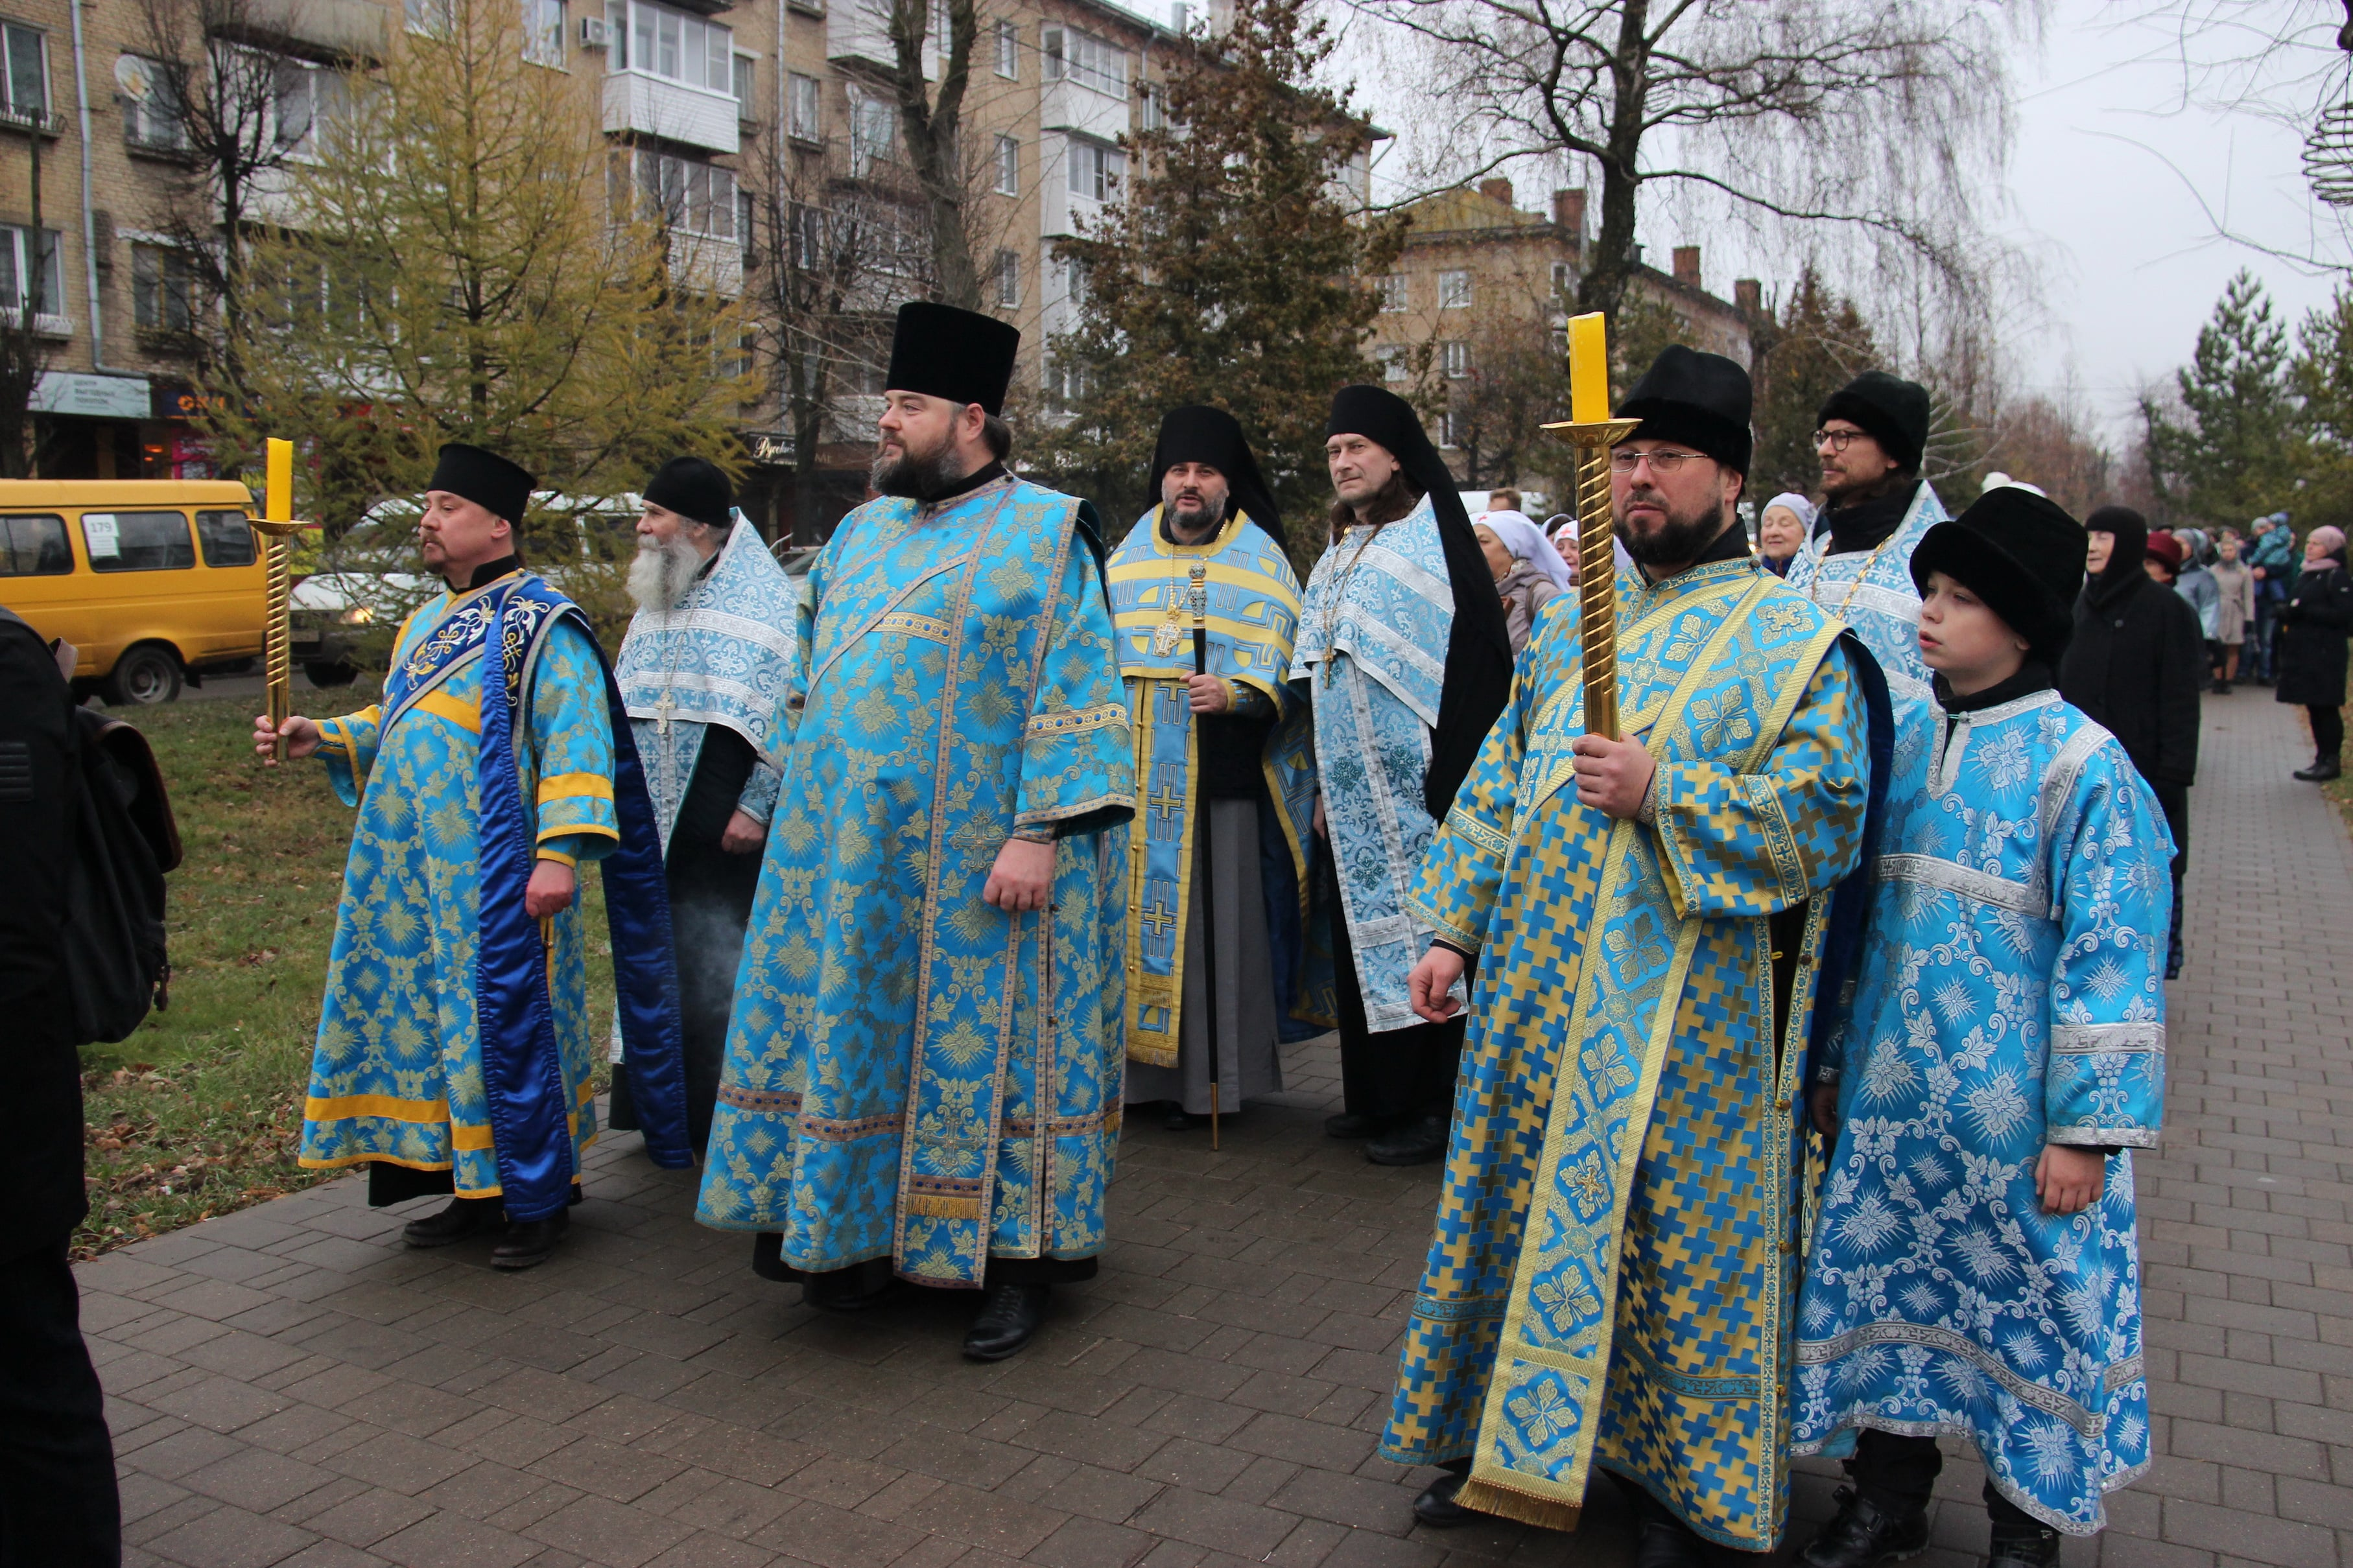 http://monuspen.ru/photoreports/e885ad143ffeae12541ceee7e7725b2e.JPG